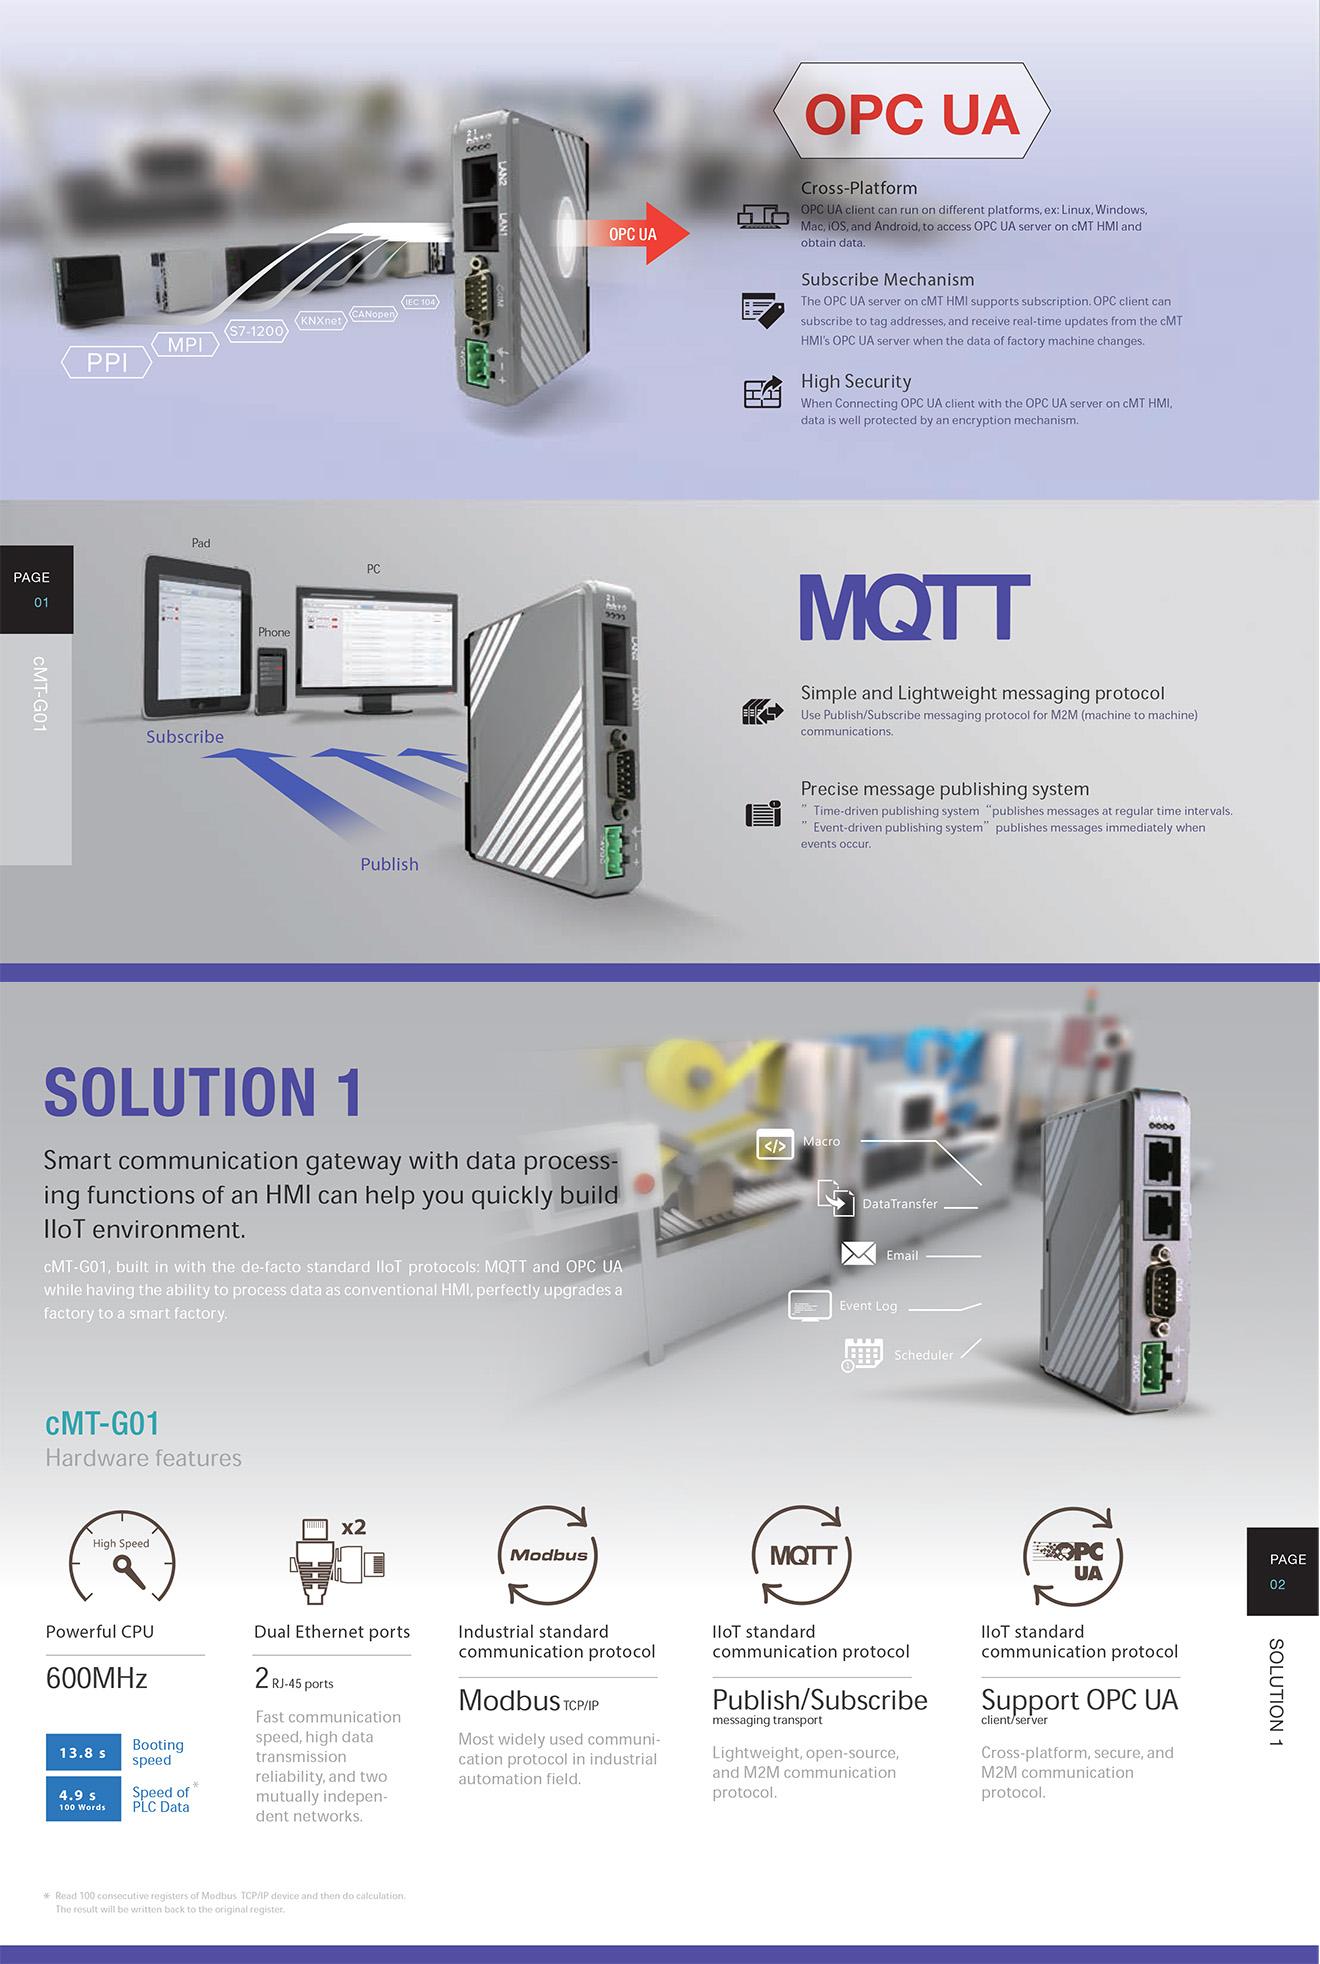 Solution 1_cMT-IIoT Dong Vai Tro Gateway Chuyen Doi Truyen Thong Du Lieu